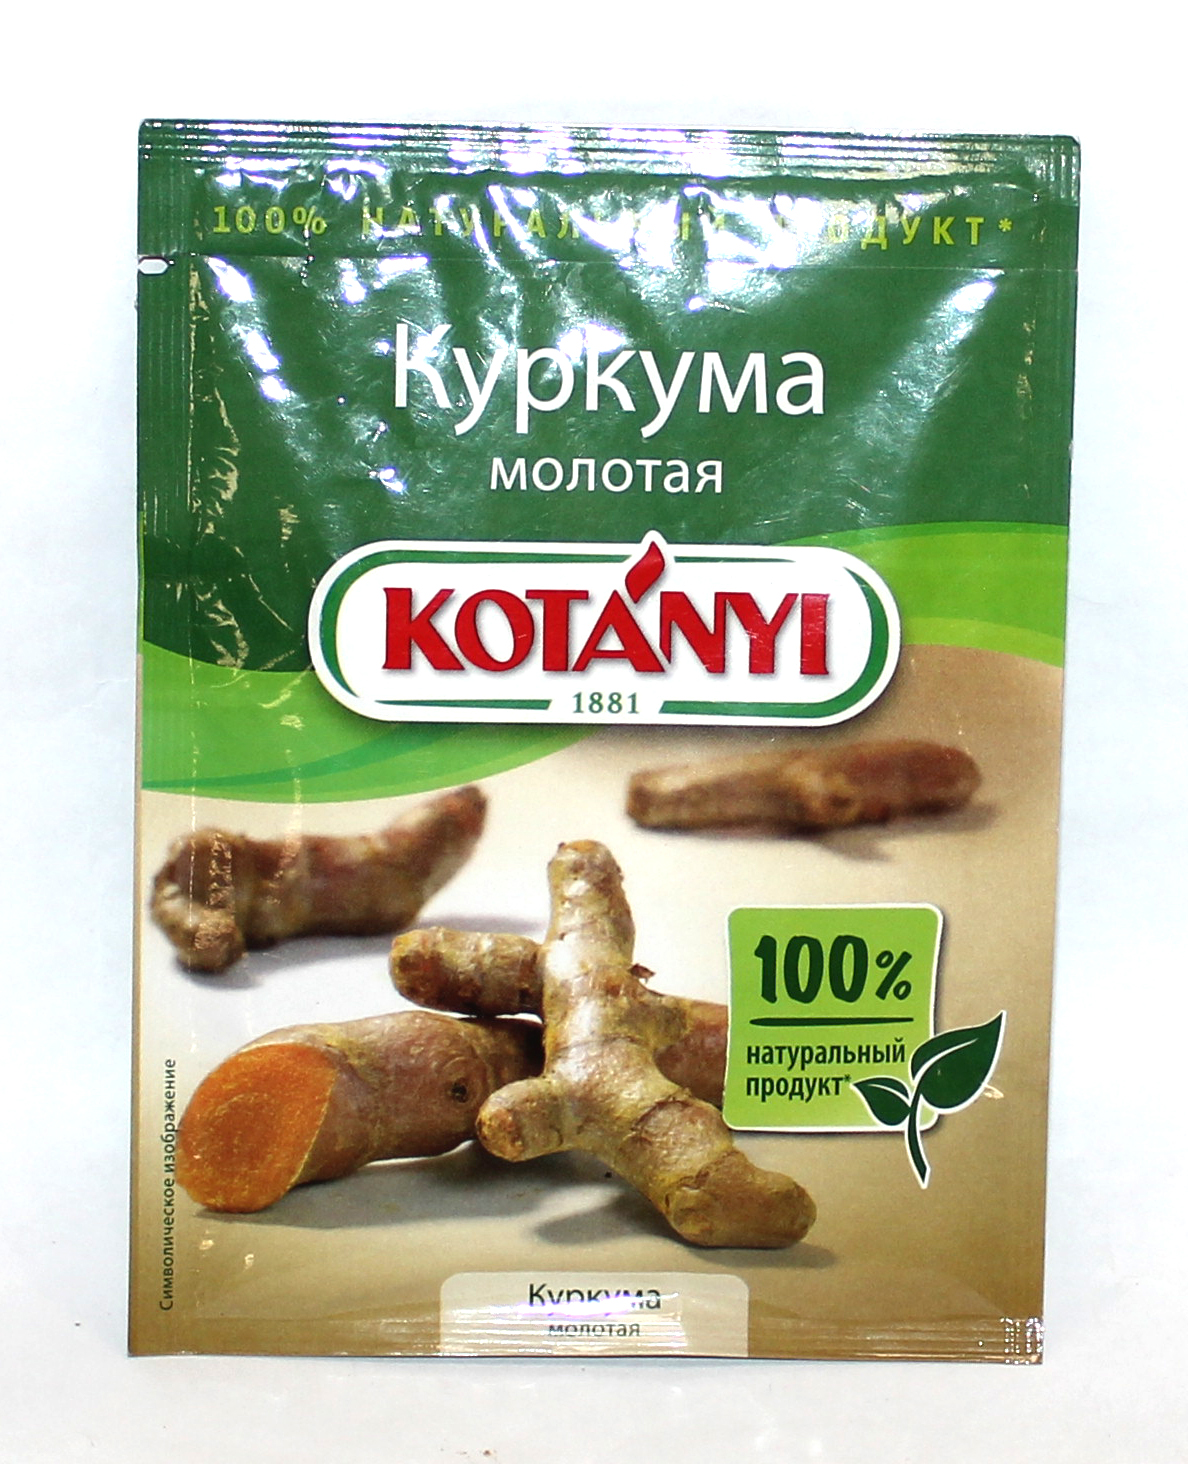 KOTANYI - КУРКУМА KOTANYI 20гр МОЛОТАЯ 9001414215999